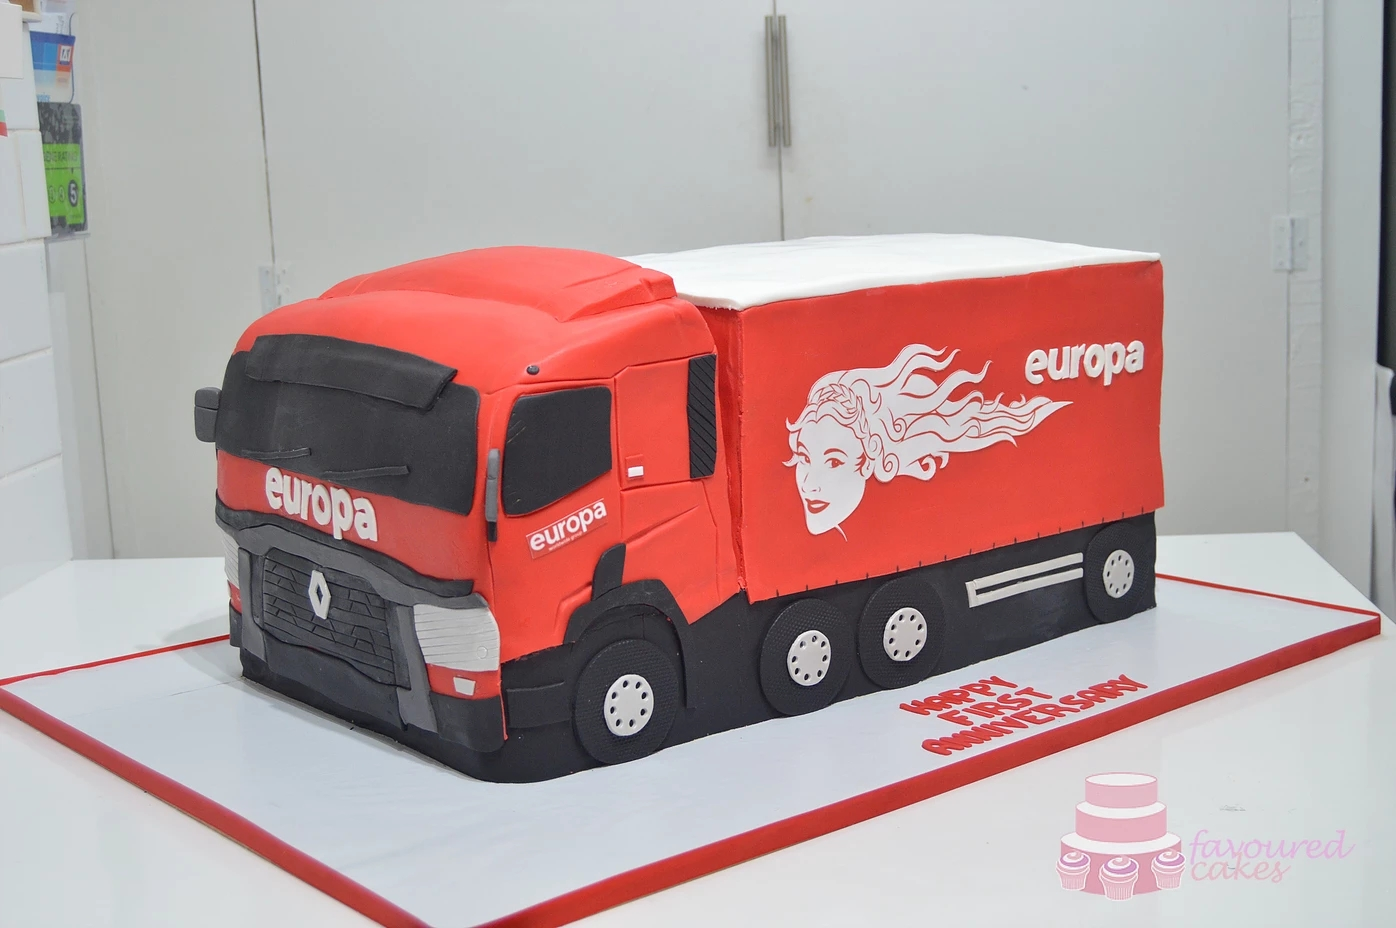 Europa Corporate Truck Cake